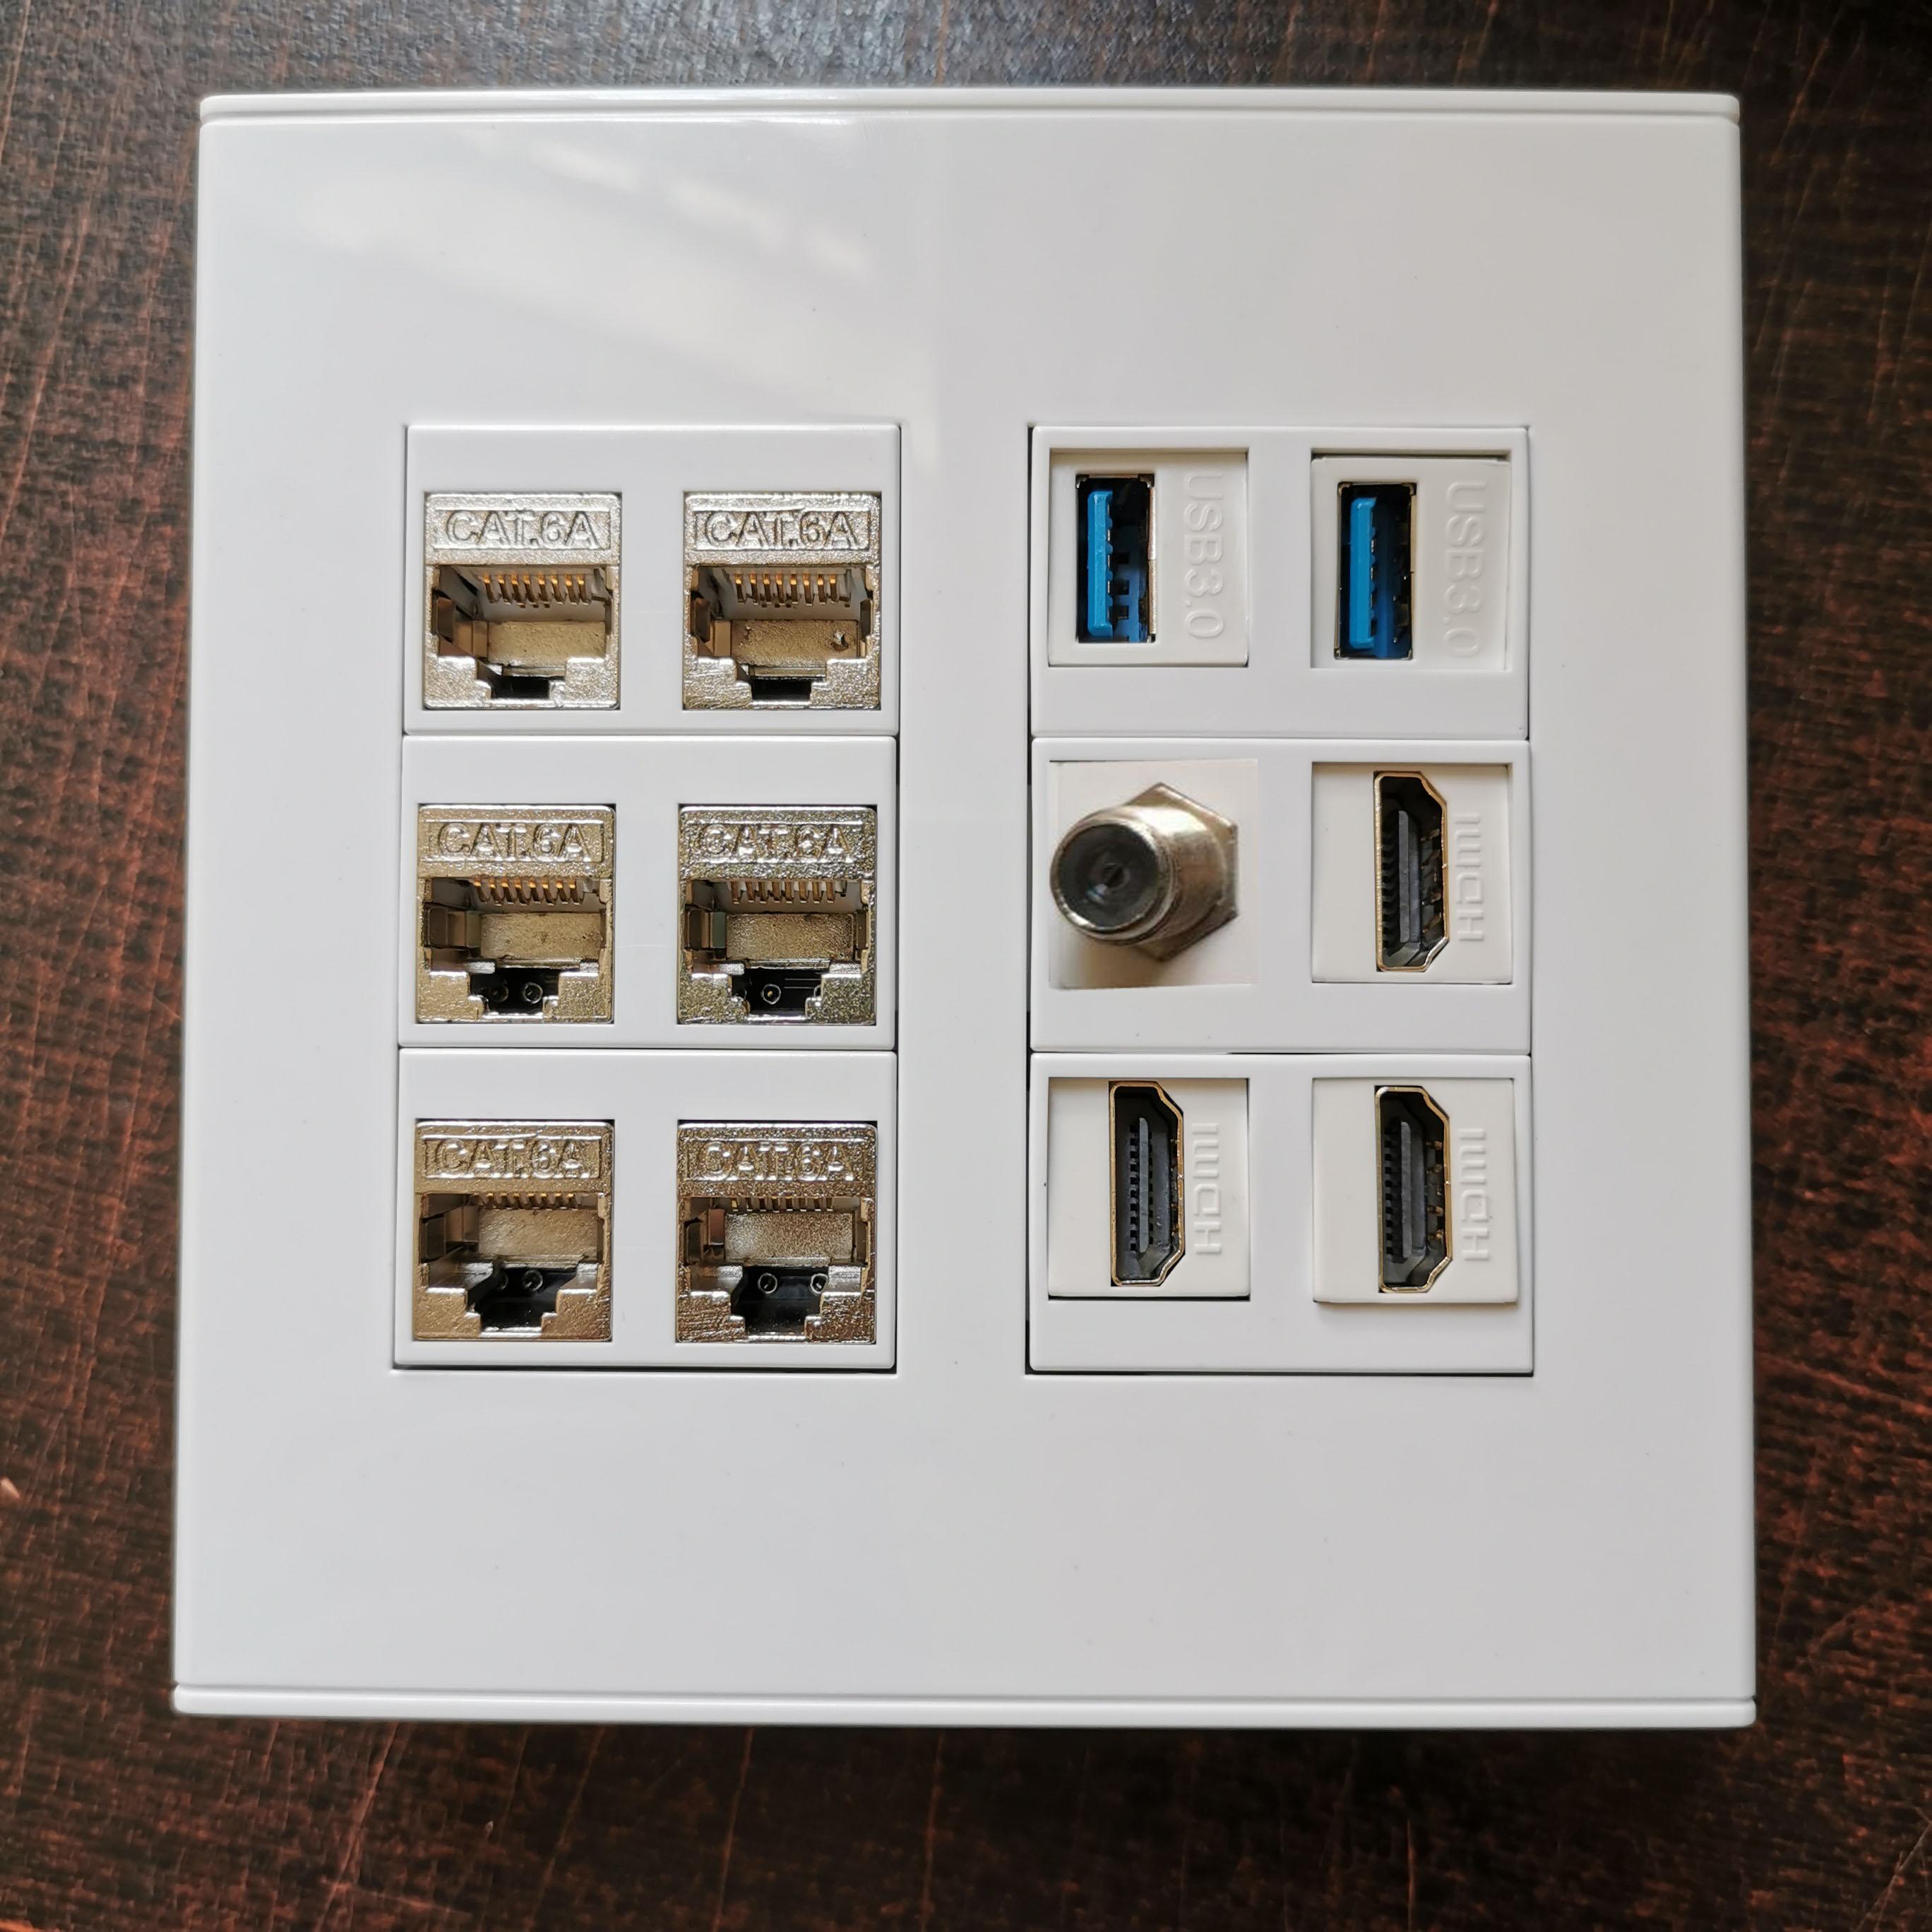 120x120mm diy placa frontal com f cabeça tv 2 portas usb3.0 hdmi2.0 6 soquetes cat6a rj45